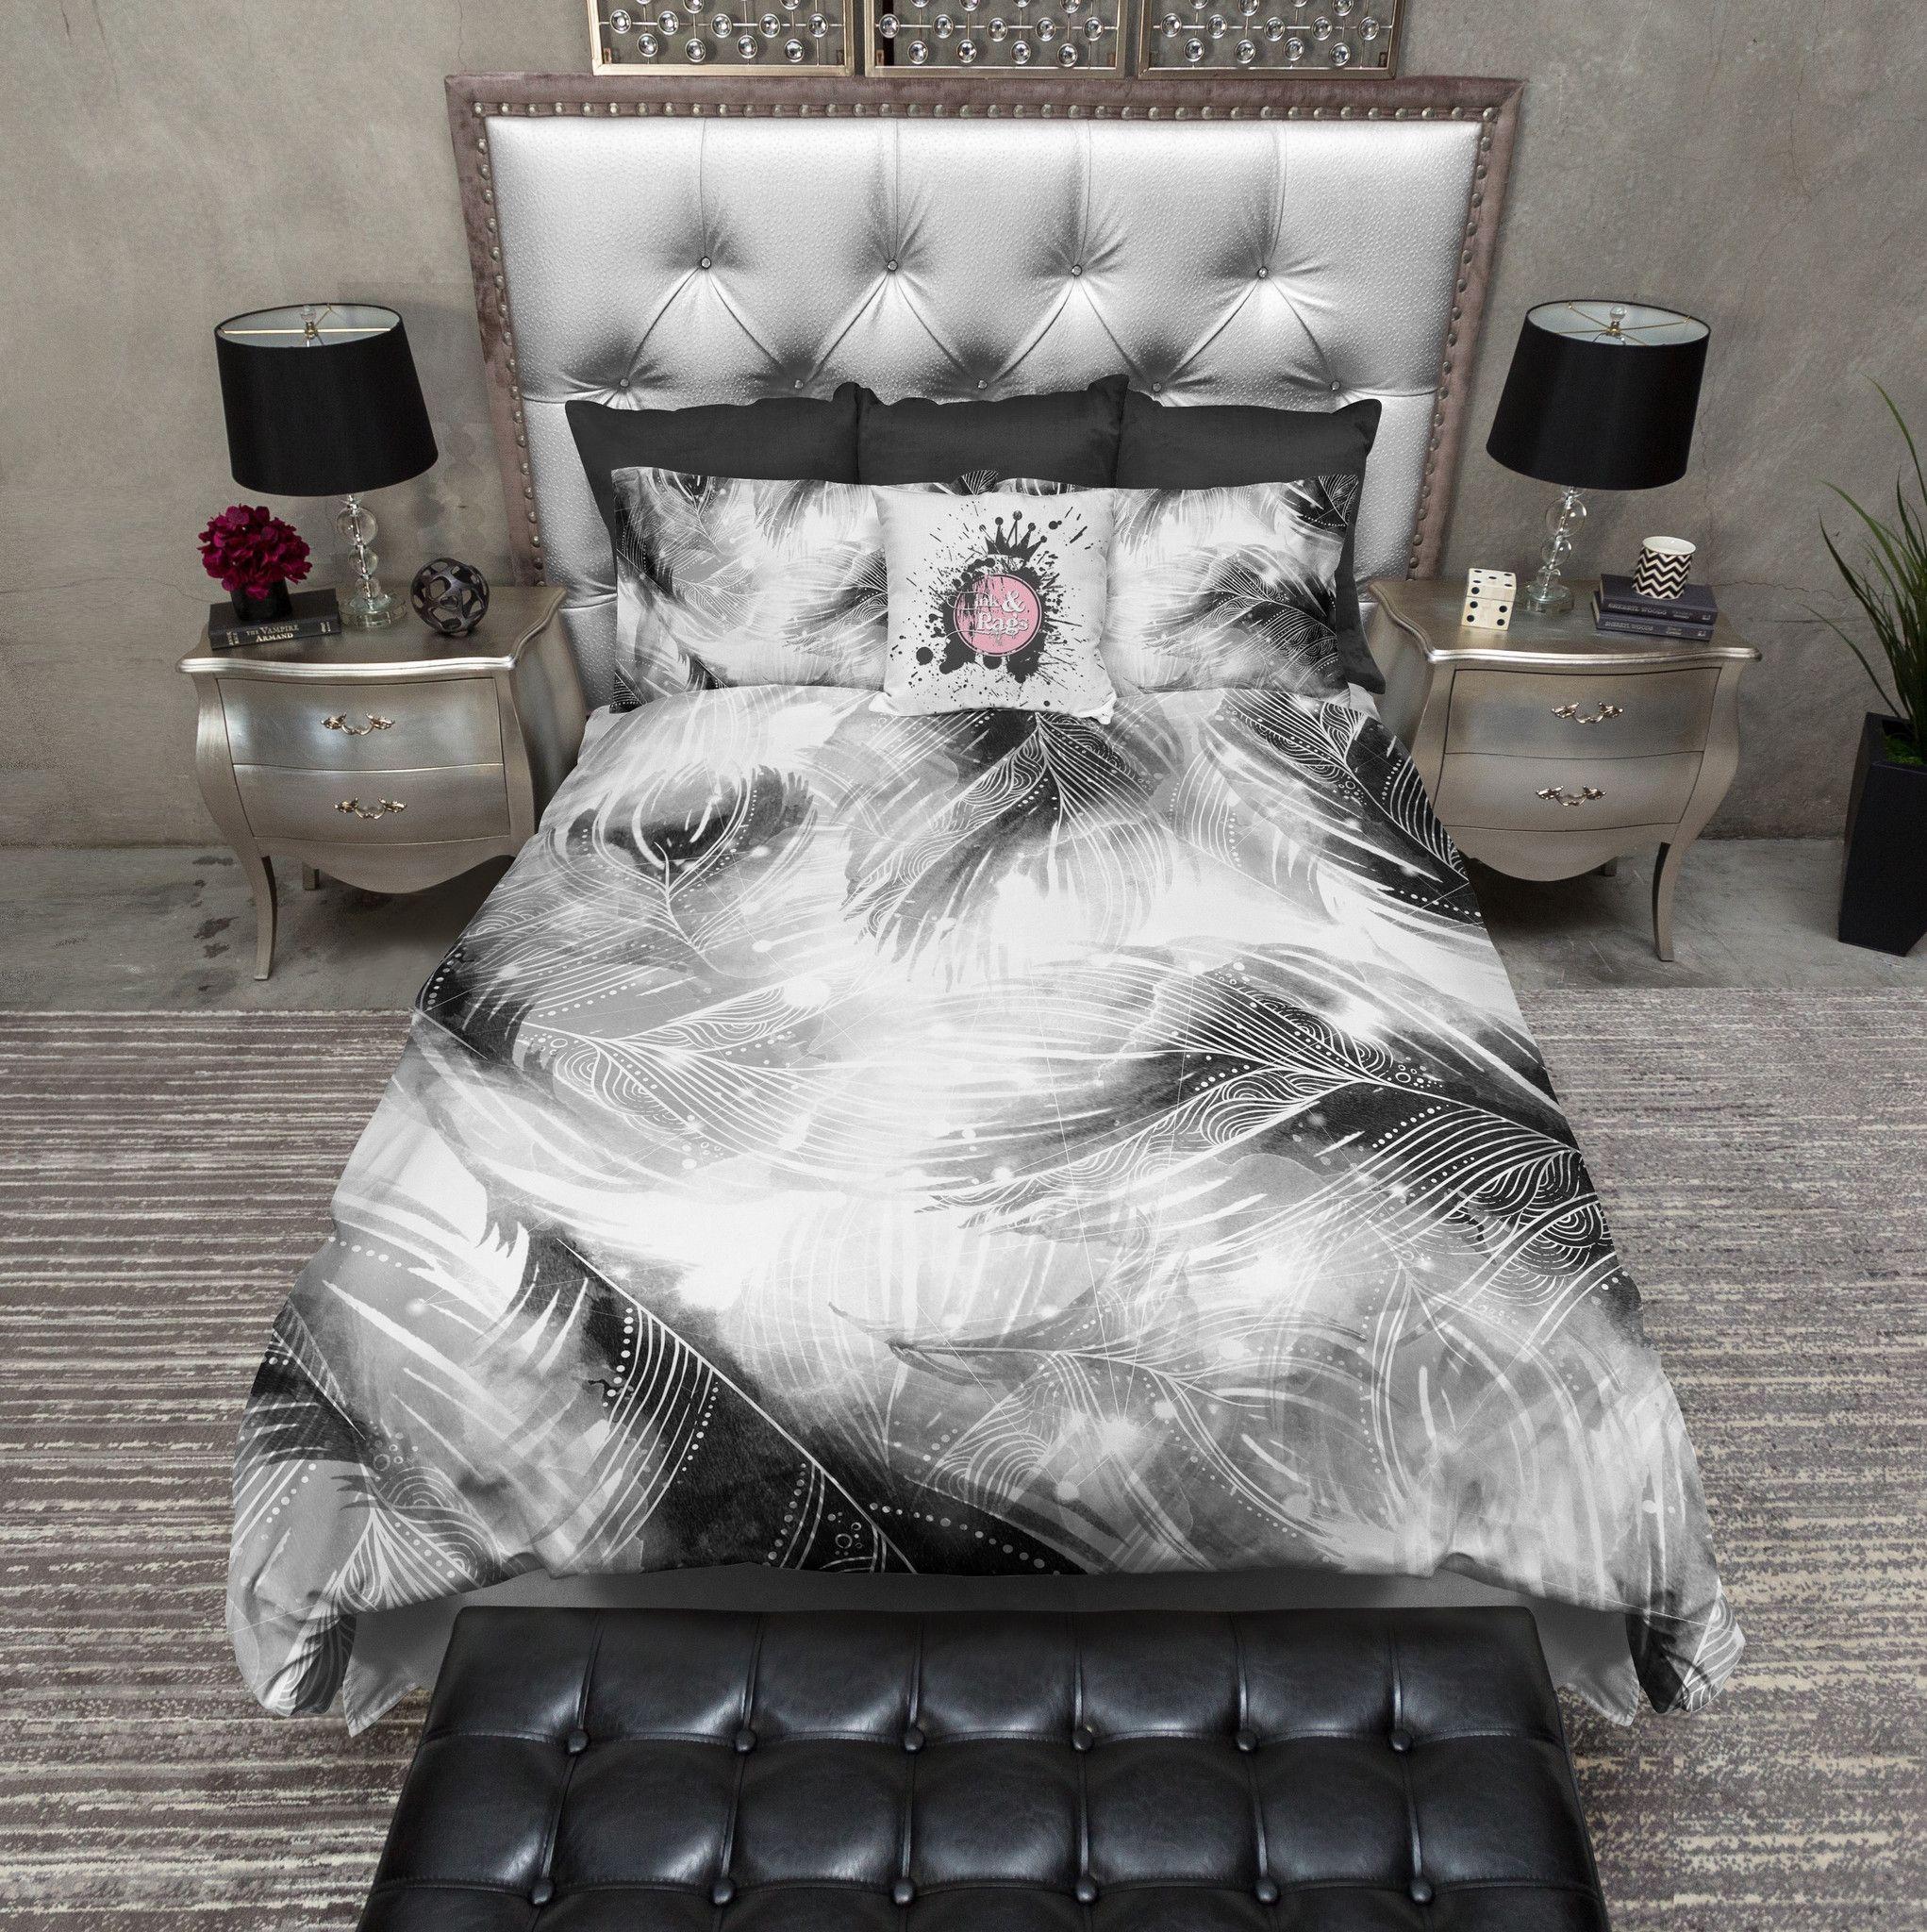 Black And White Boho Feather Bedding Duvet Bedding Sets Bedding